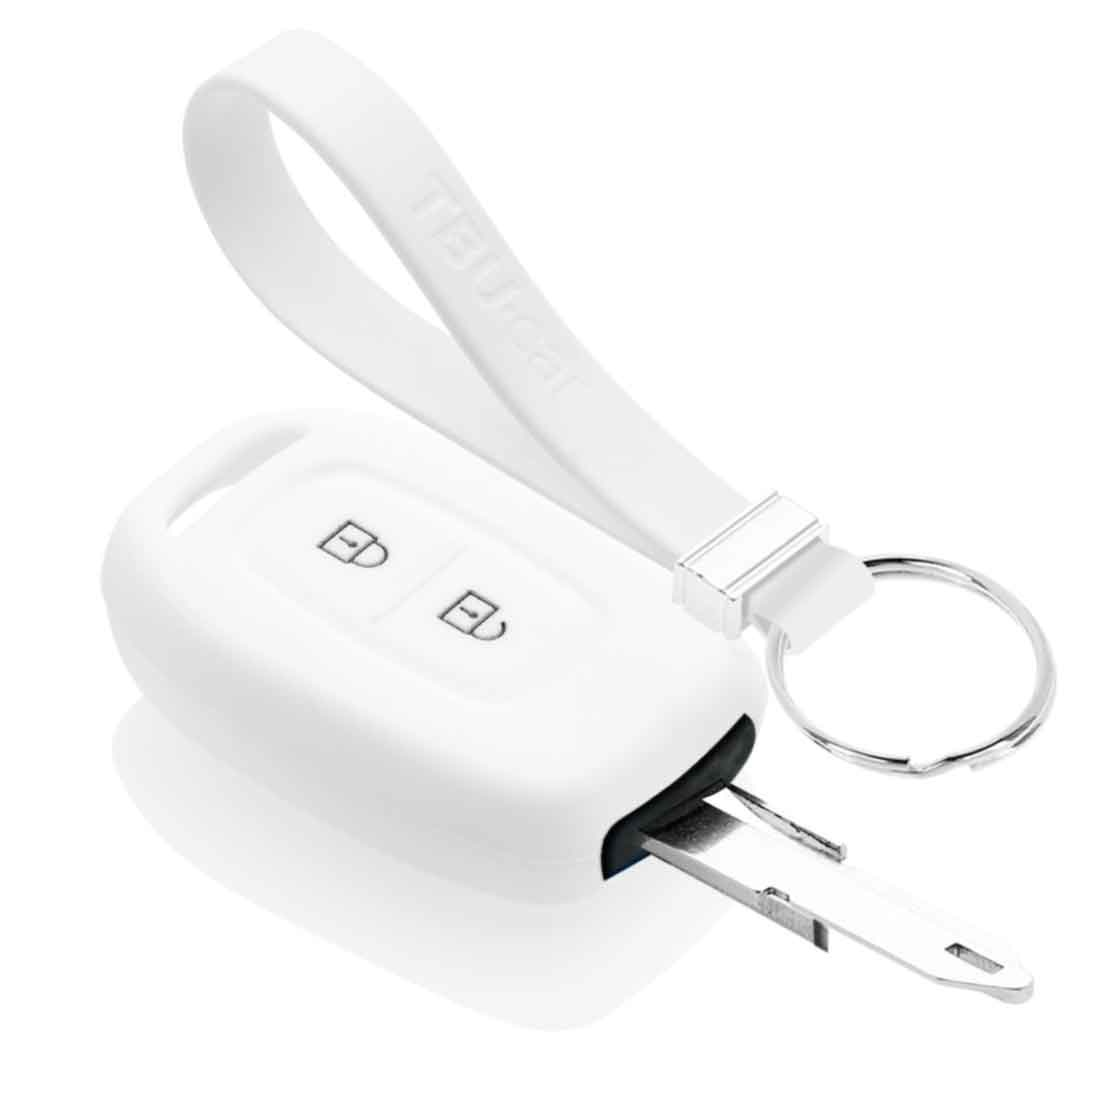 TBU car TBU car Sleutel cover compatibel met Dacia - Silicone sleutelhoesje - beschermhoesje autosleutel - Wit